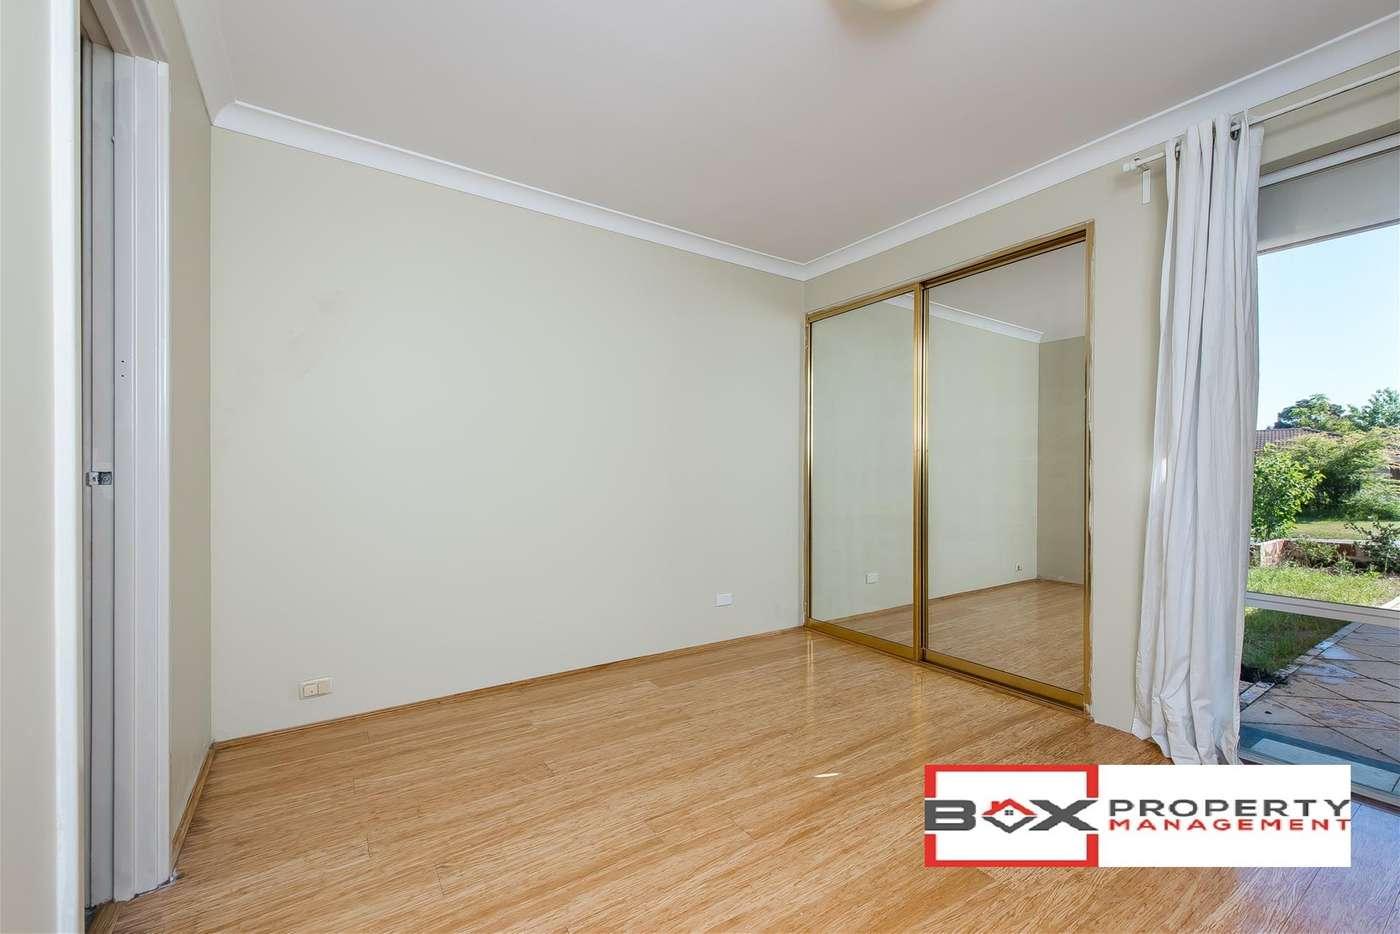 Sixth view of Homely house listing, 10 Thurburn Retreat, Marangaroo WA 6064